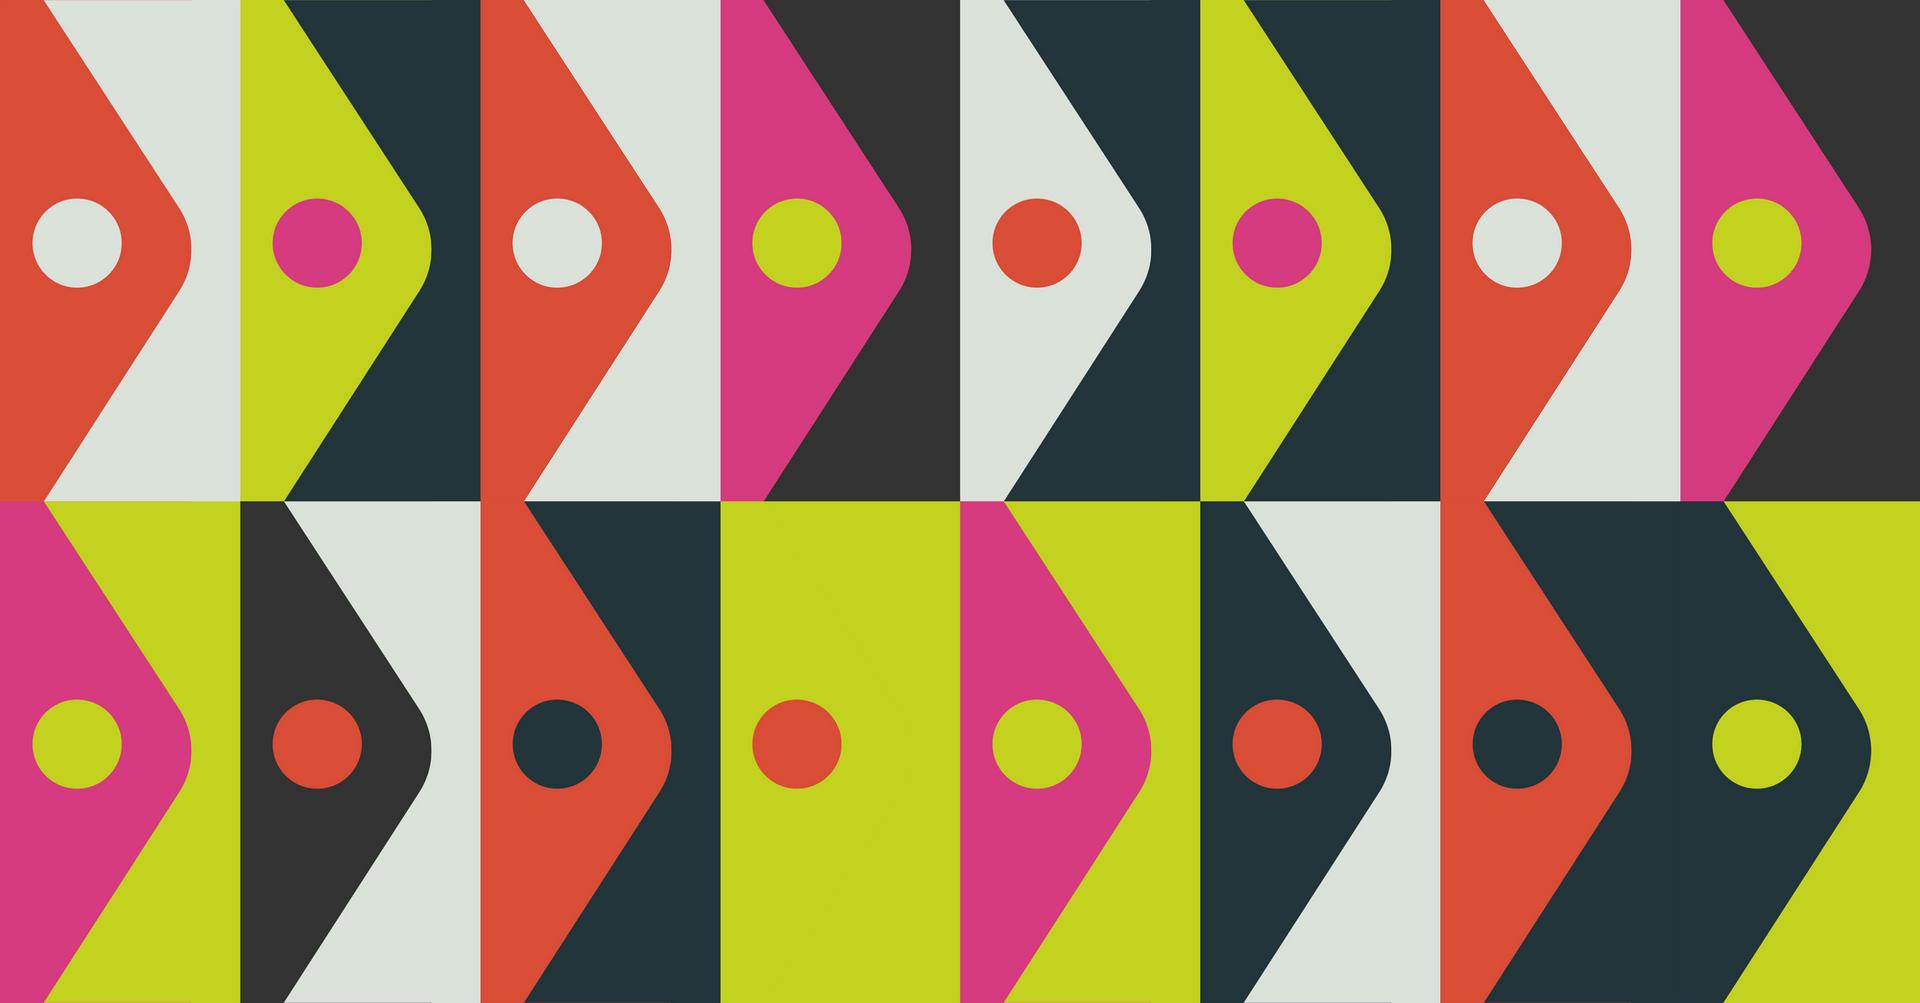 colors_ktd_Artboard 3.png